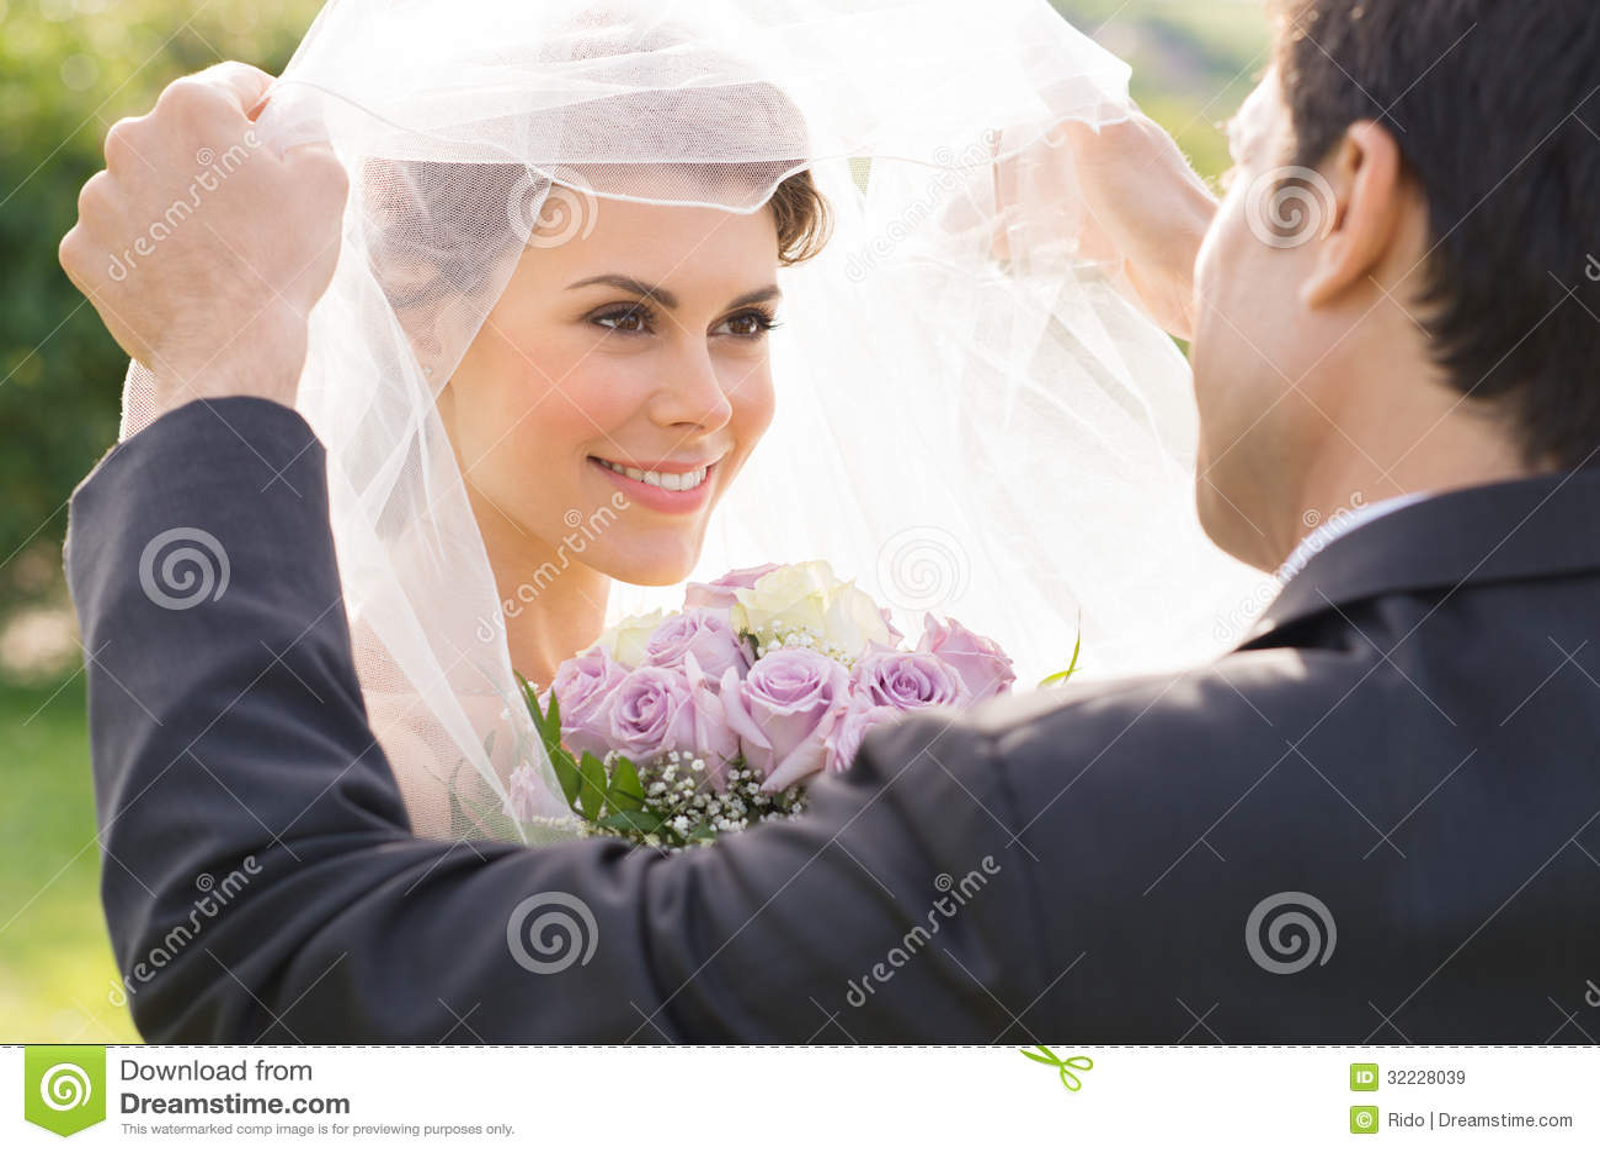 Bräutigam Looking At Bride mit Liebe